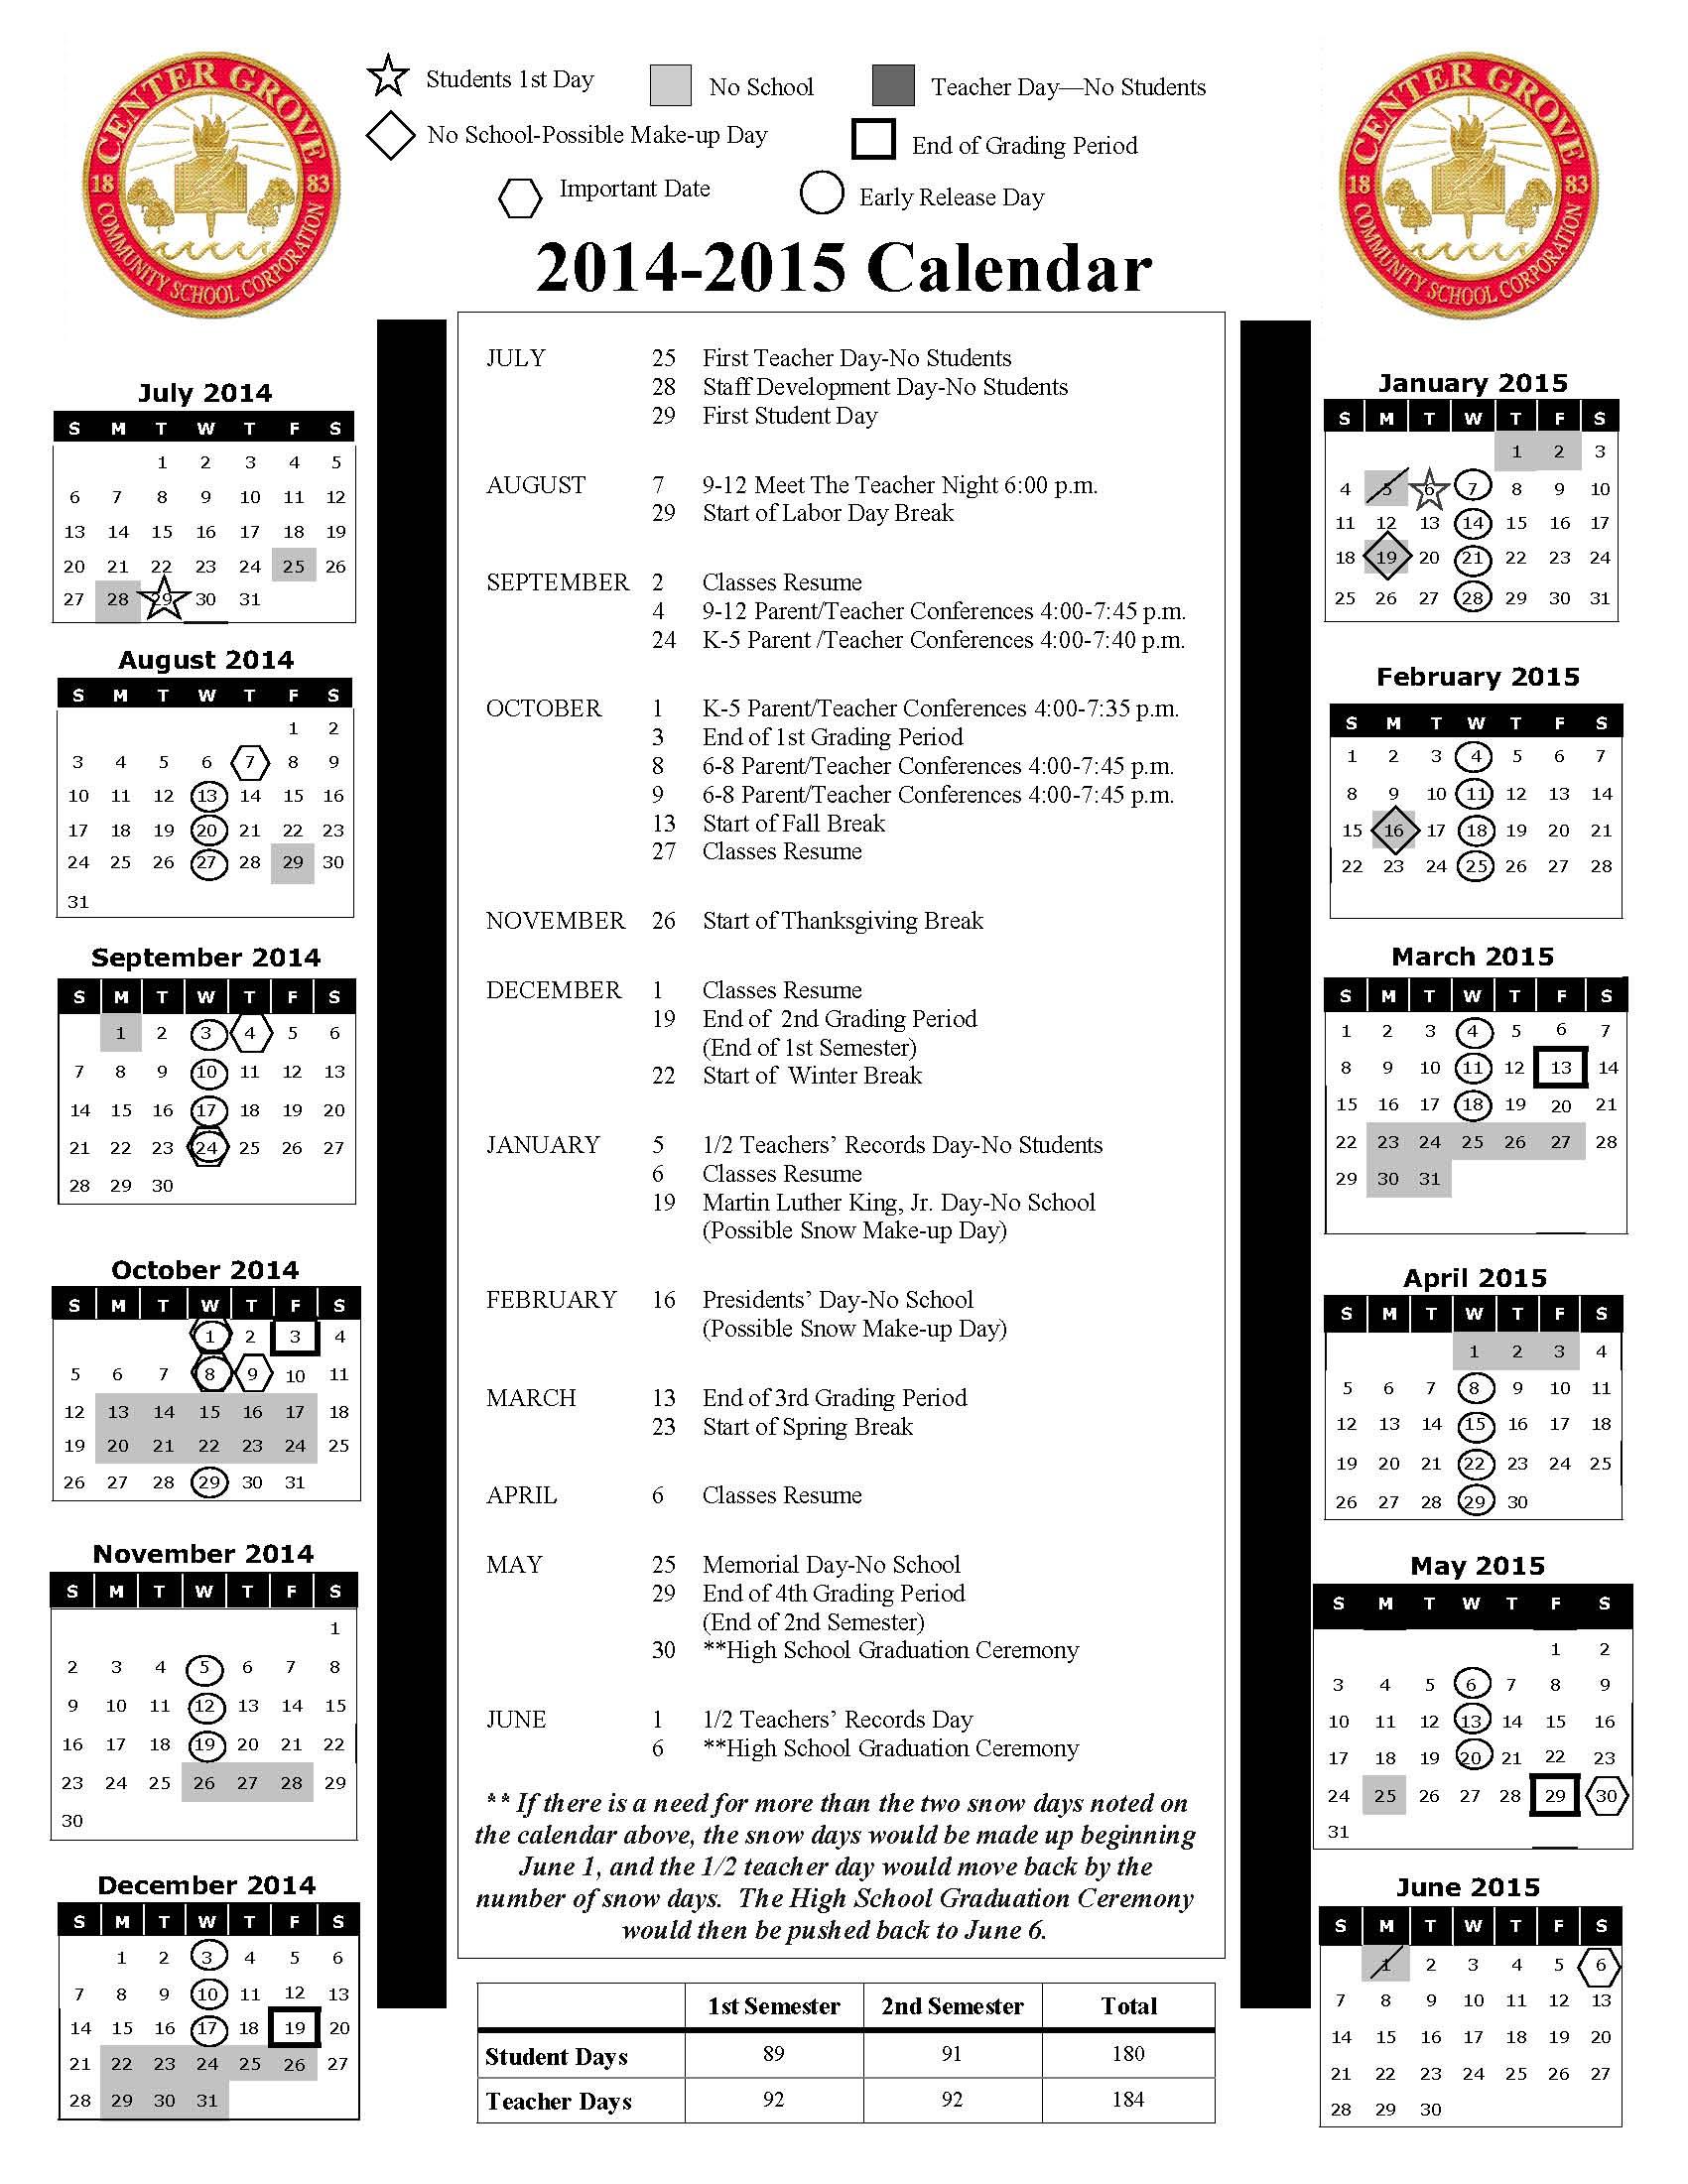 School Calendars / 2014-2015 School Calendar